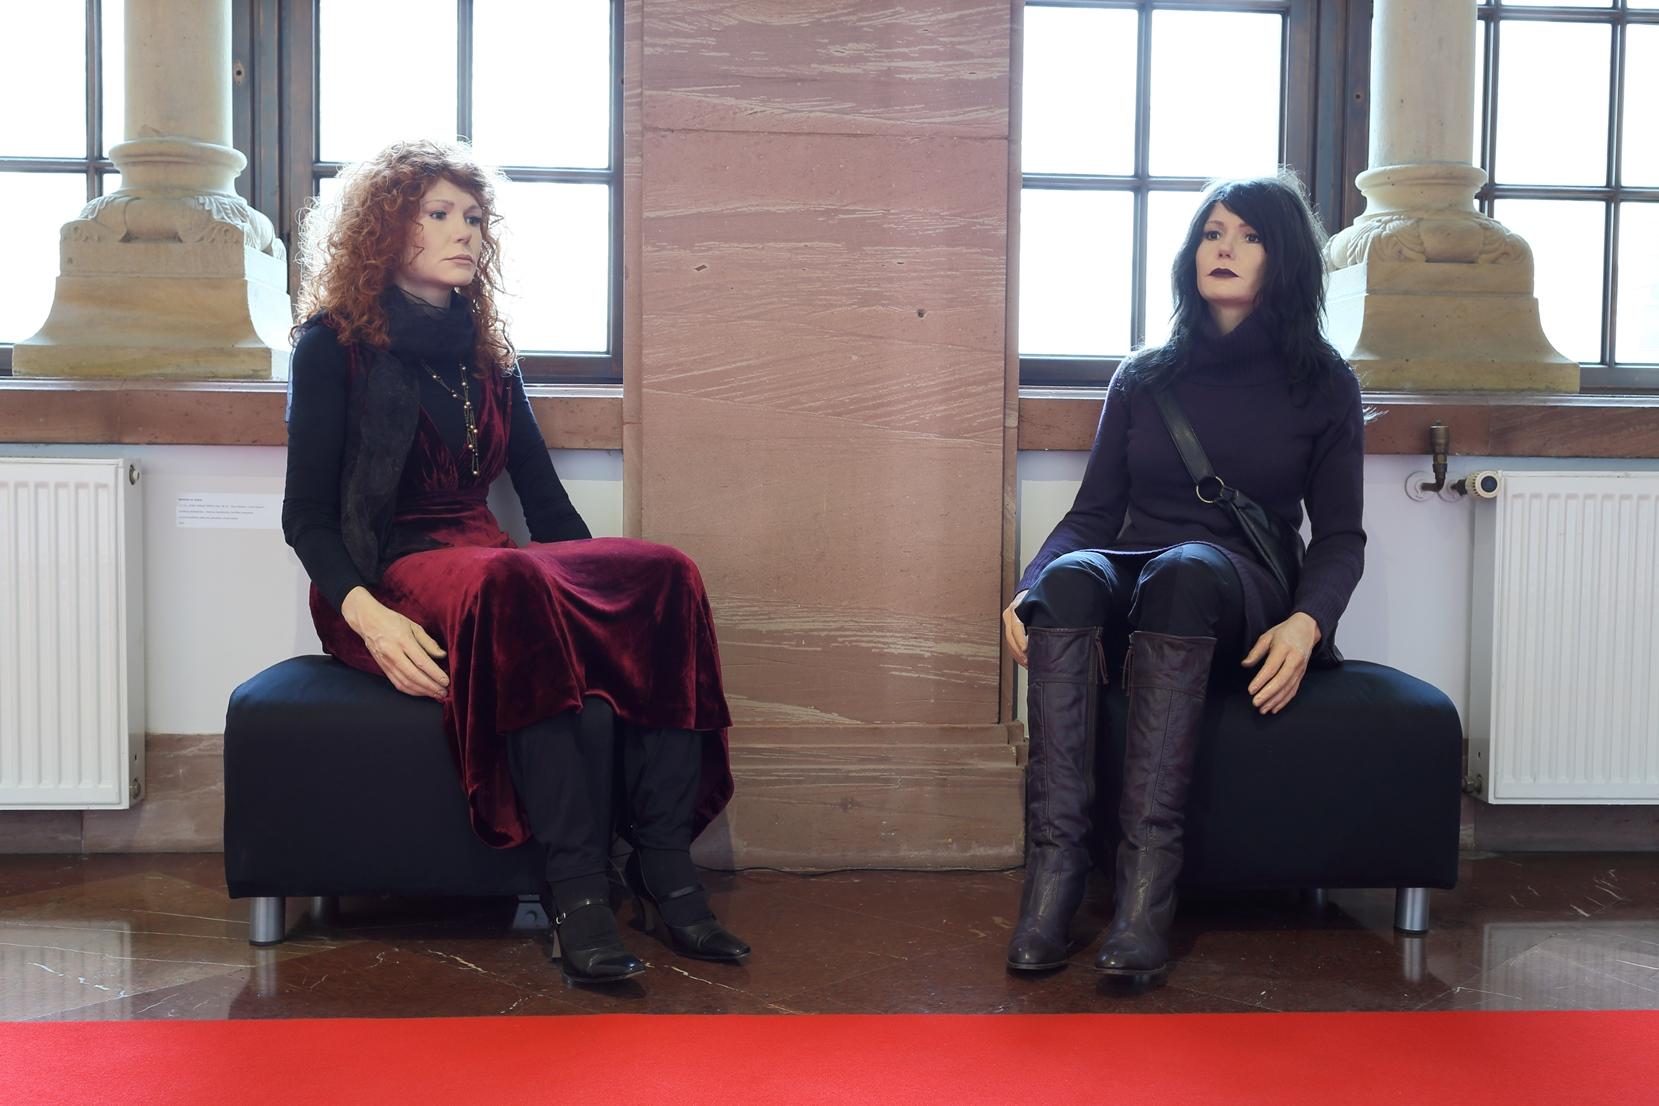 Mathilde ter Heijne, F.F.A.L. (FAKE FEMALE ARTIST LIFE)  #6, #7   Clare Abshire – Carla Vicenzi, 2007